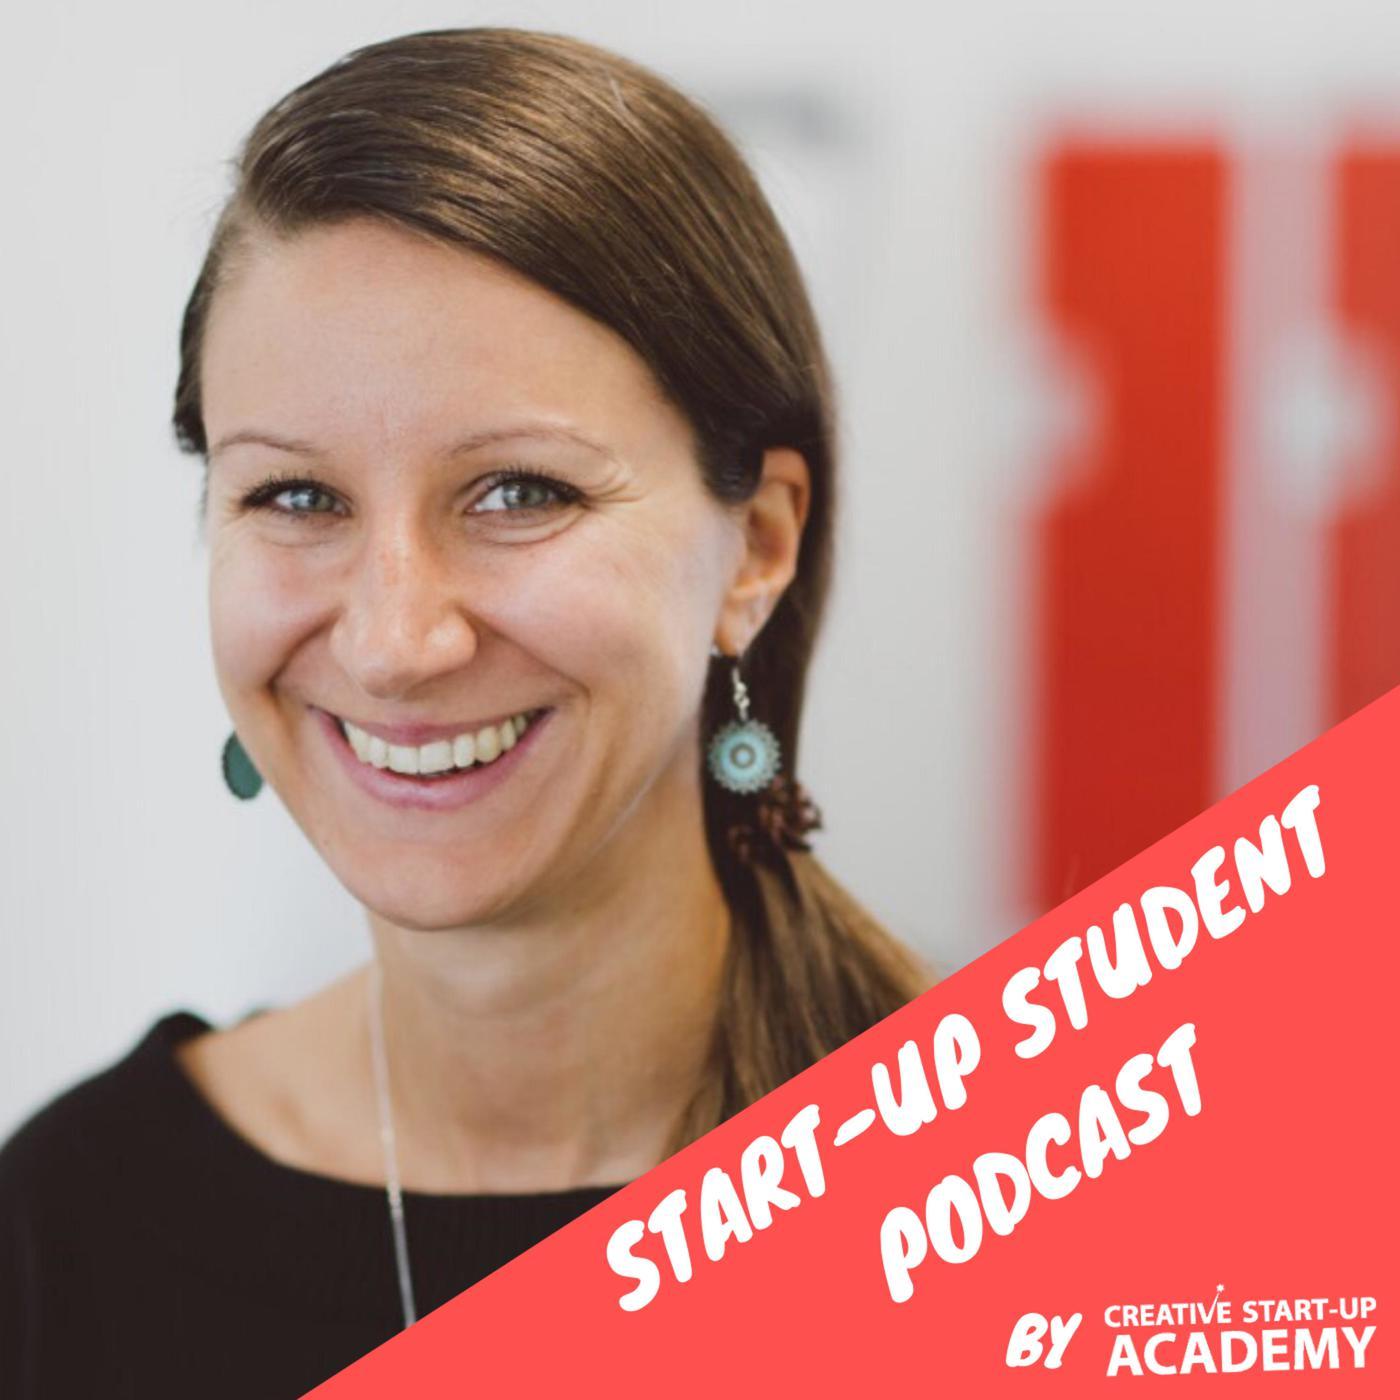 Start-Up Student